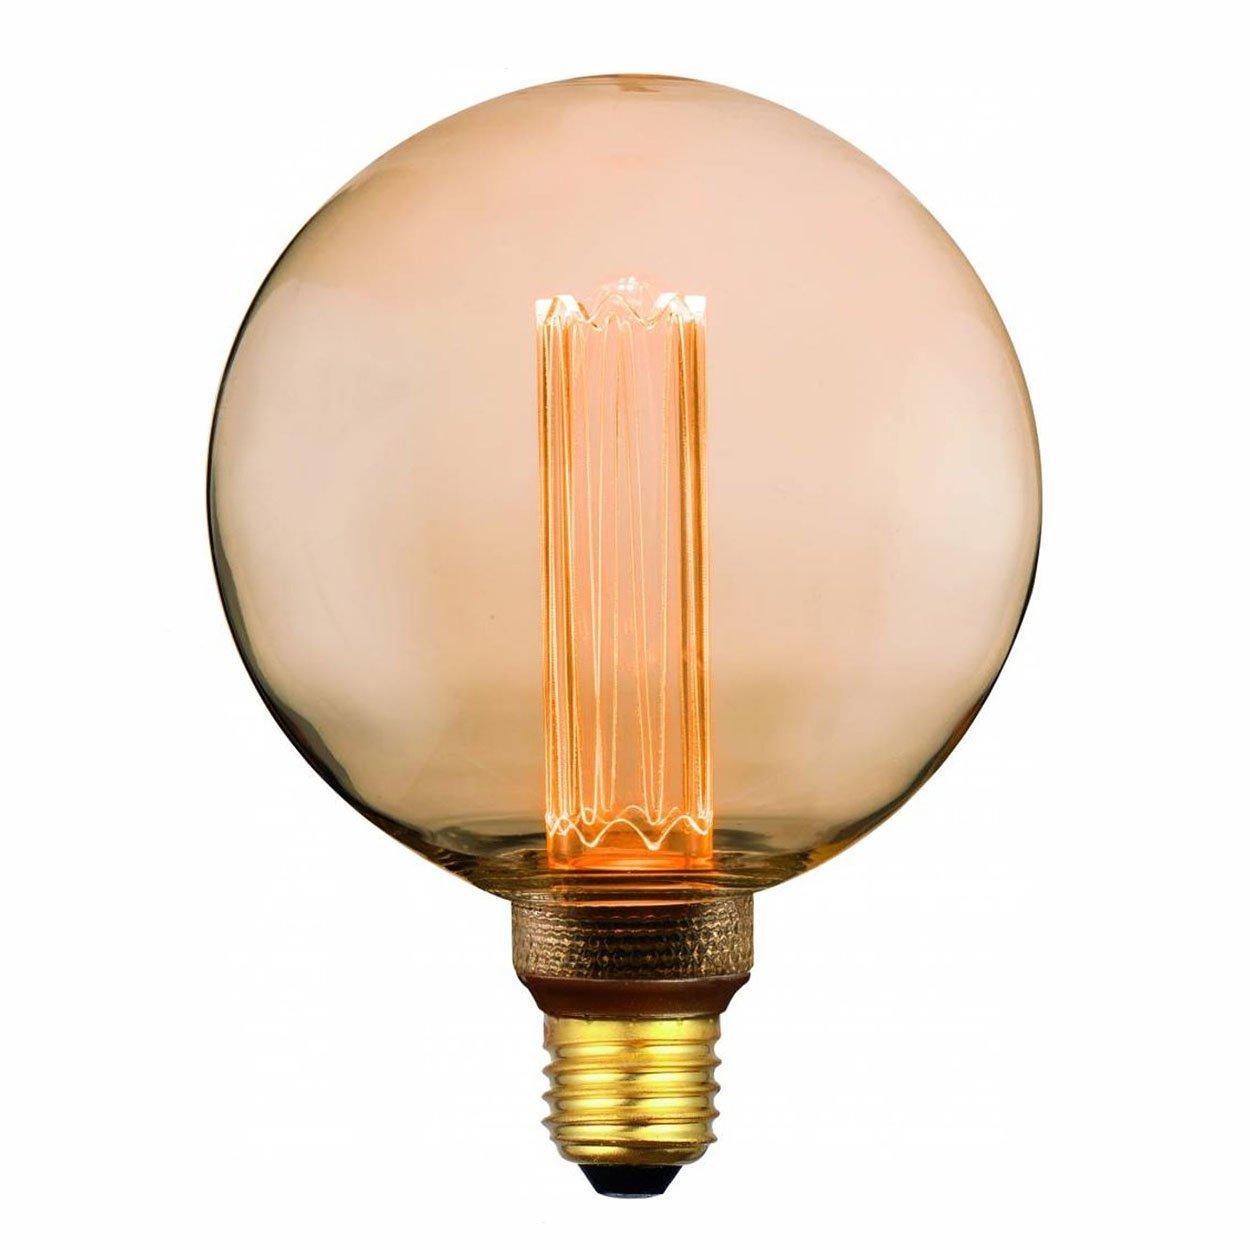 Dimbare Ledlamp 3Standen Goud 12.5cm